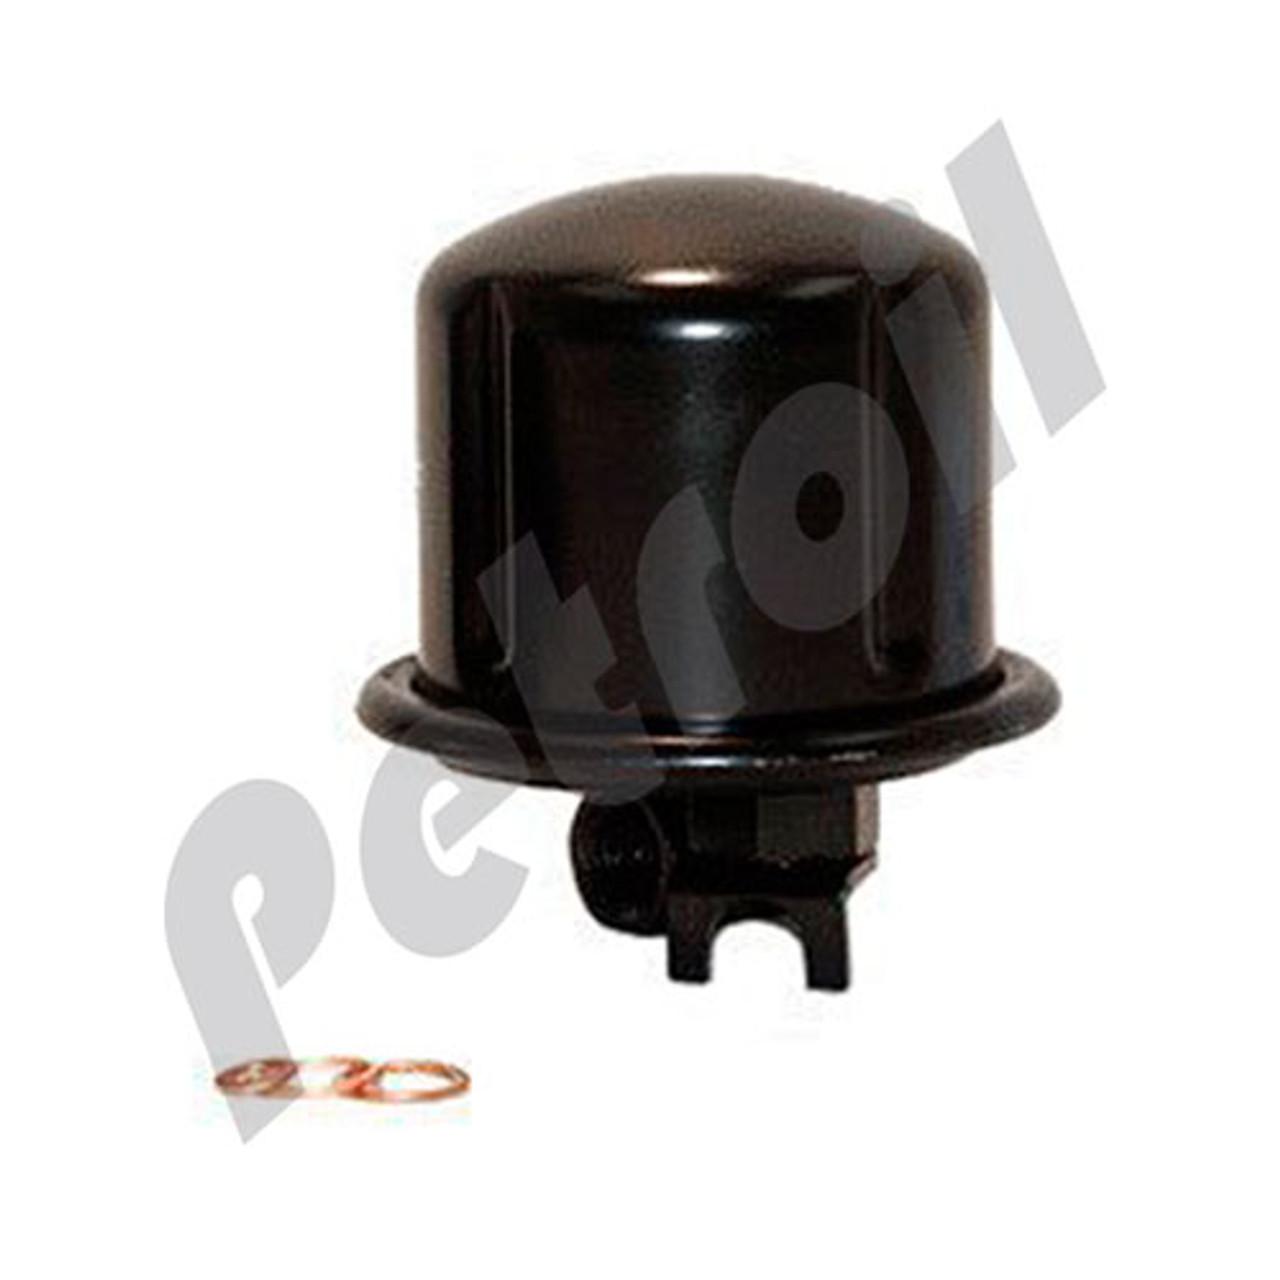 wix fuel filter honda civic (injection) (92-96) honda accord 4l 2 2 lt  (92-94)  petroil usa